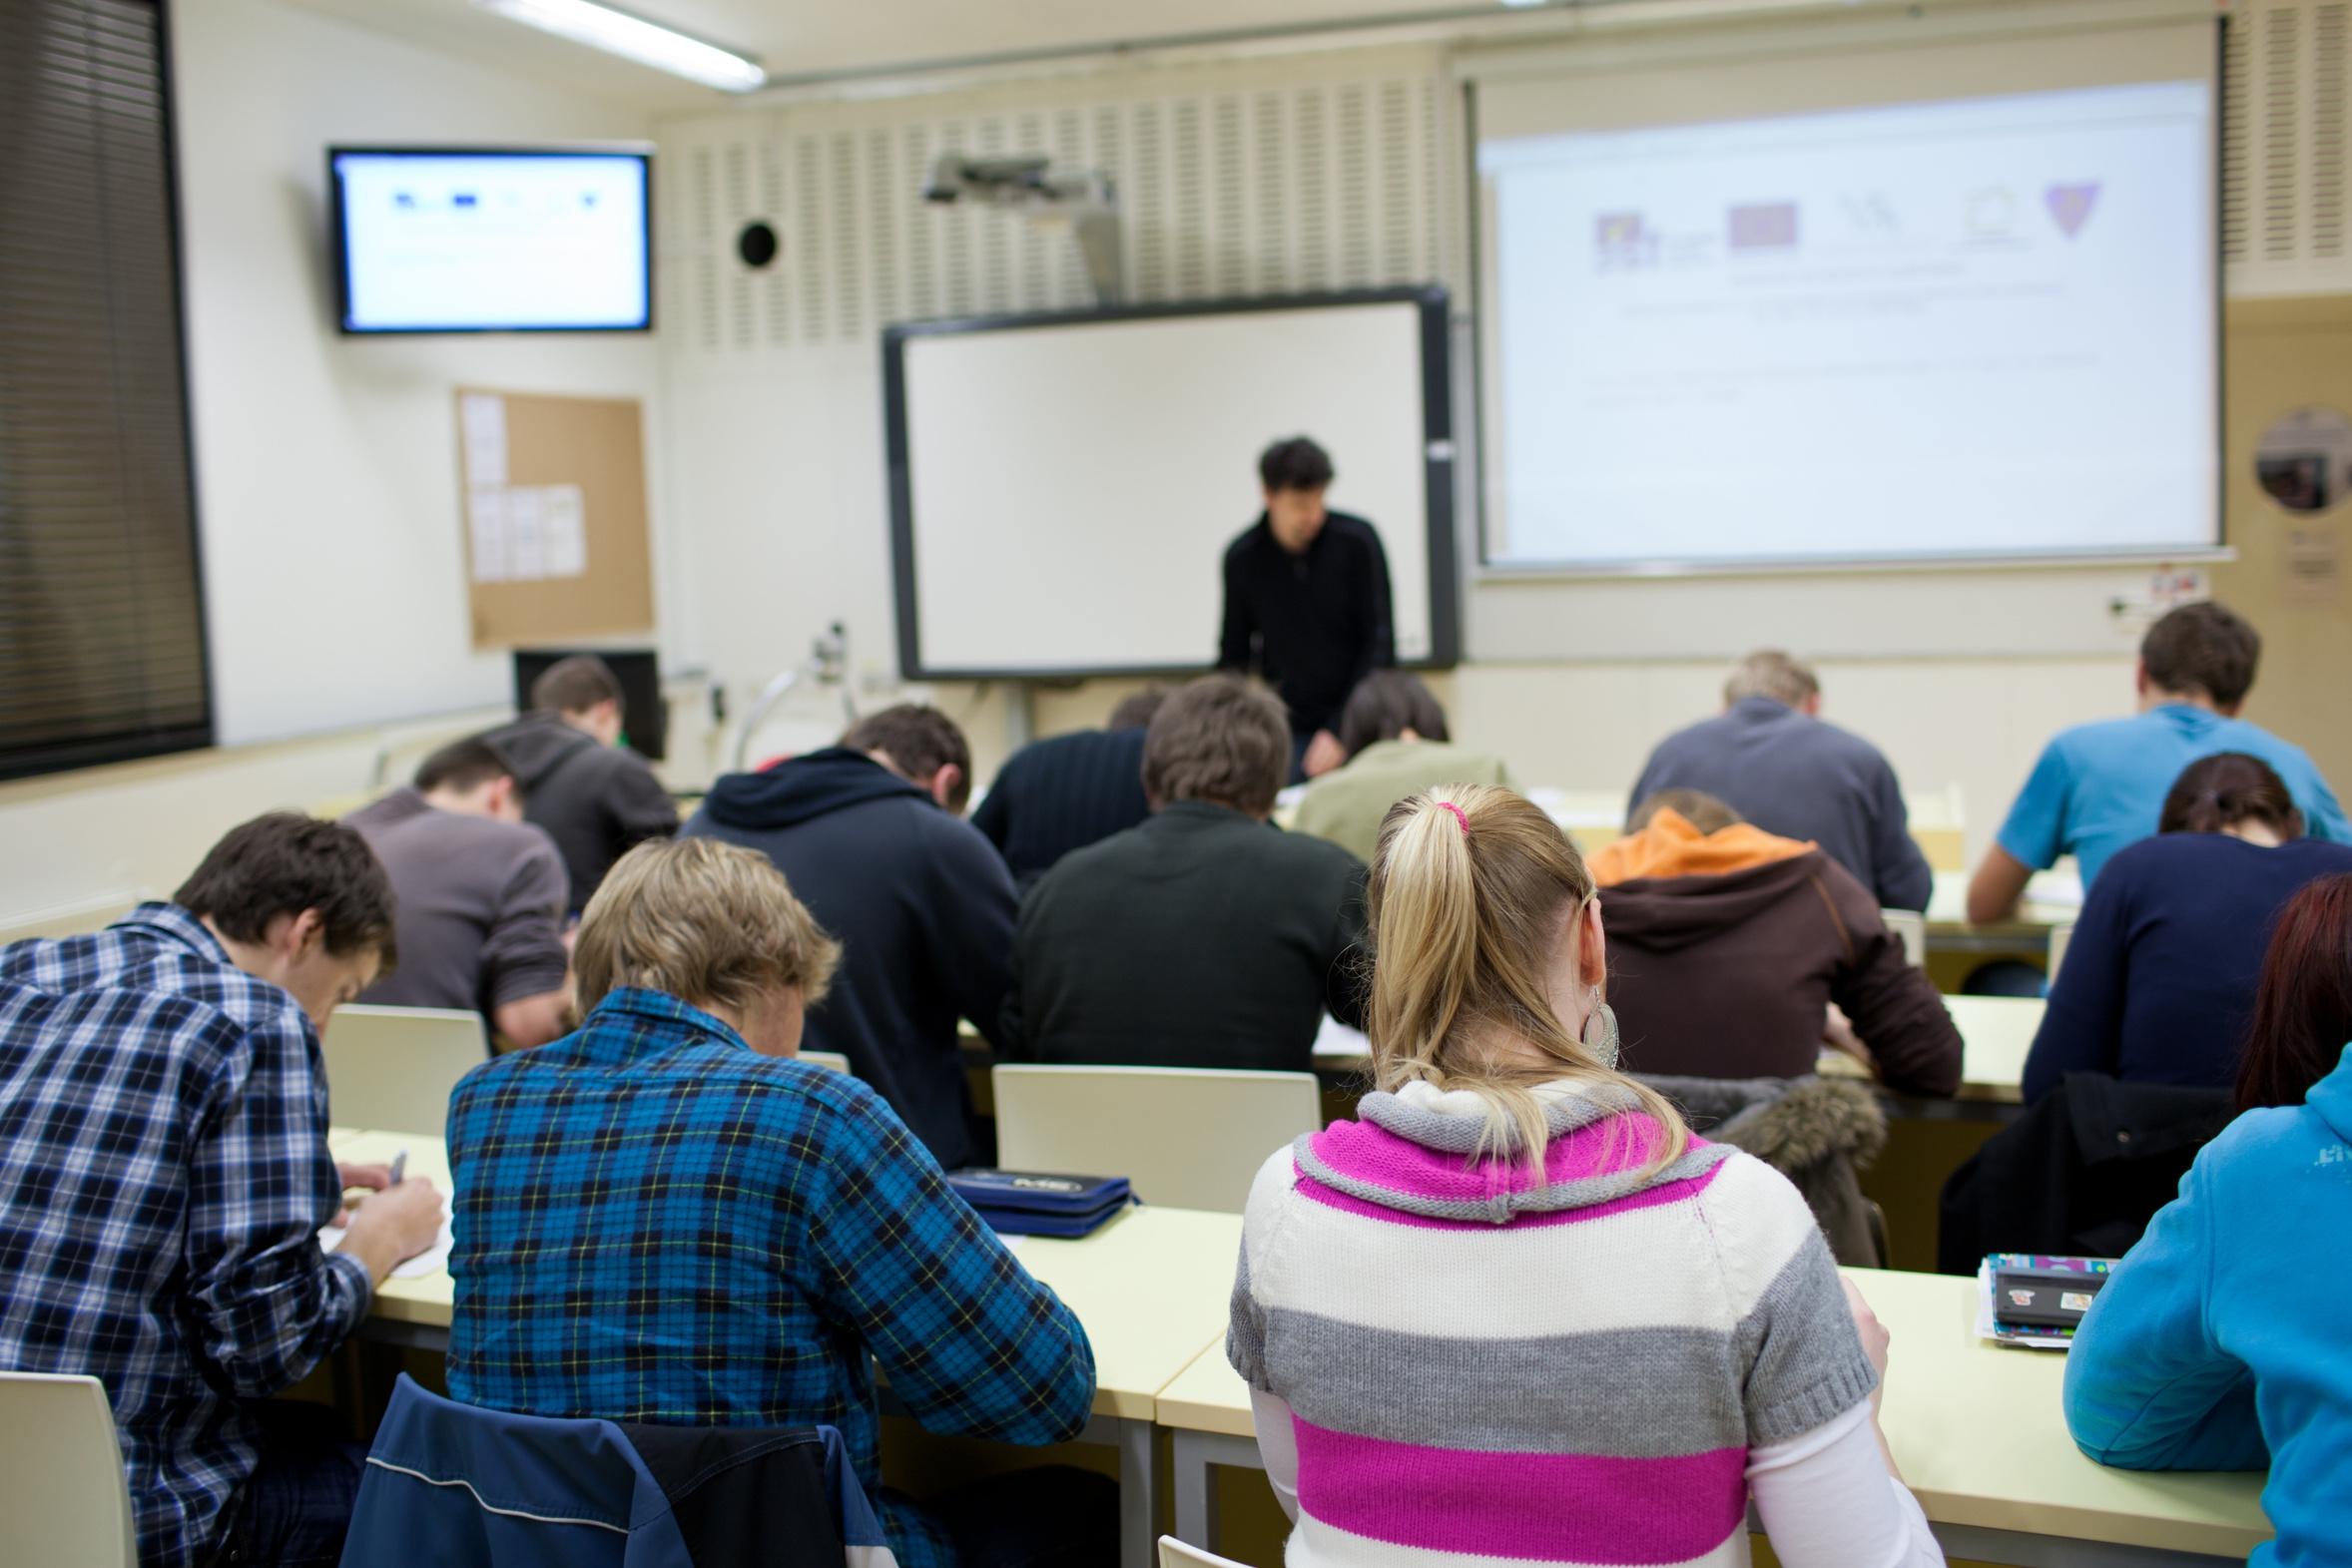 Salon europ en de recrutement tudiants study in europe for Salon emploi nord